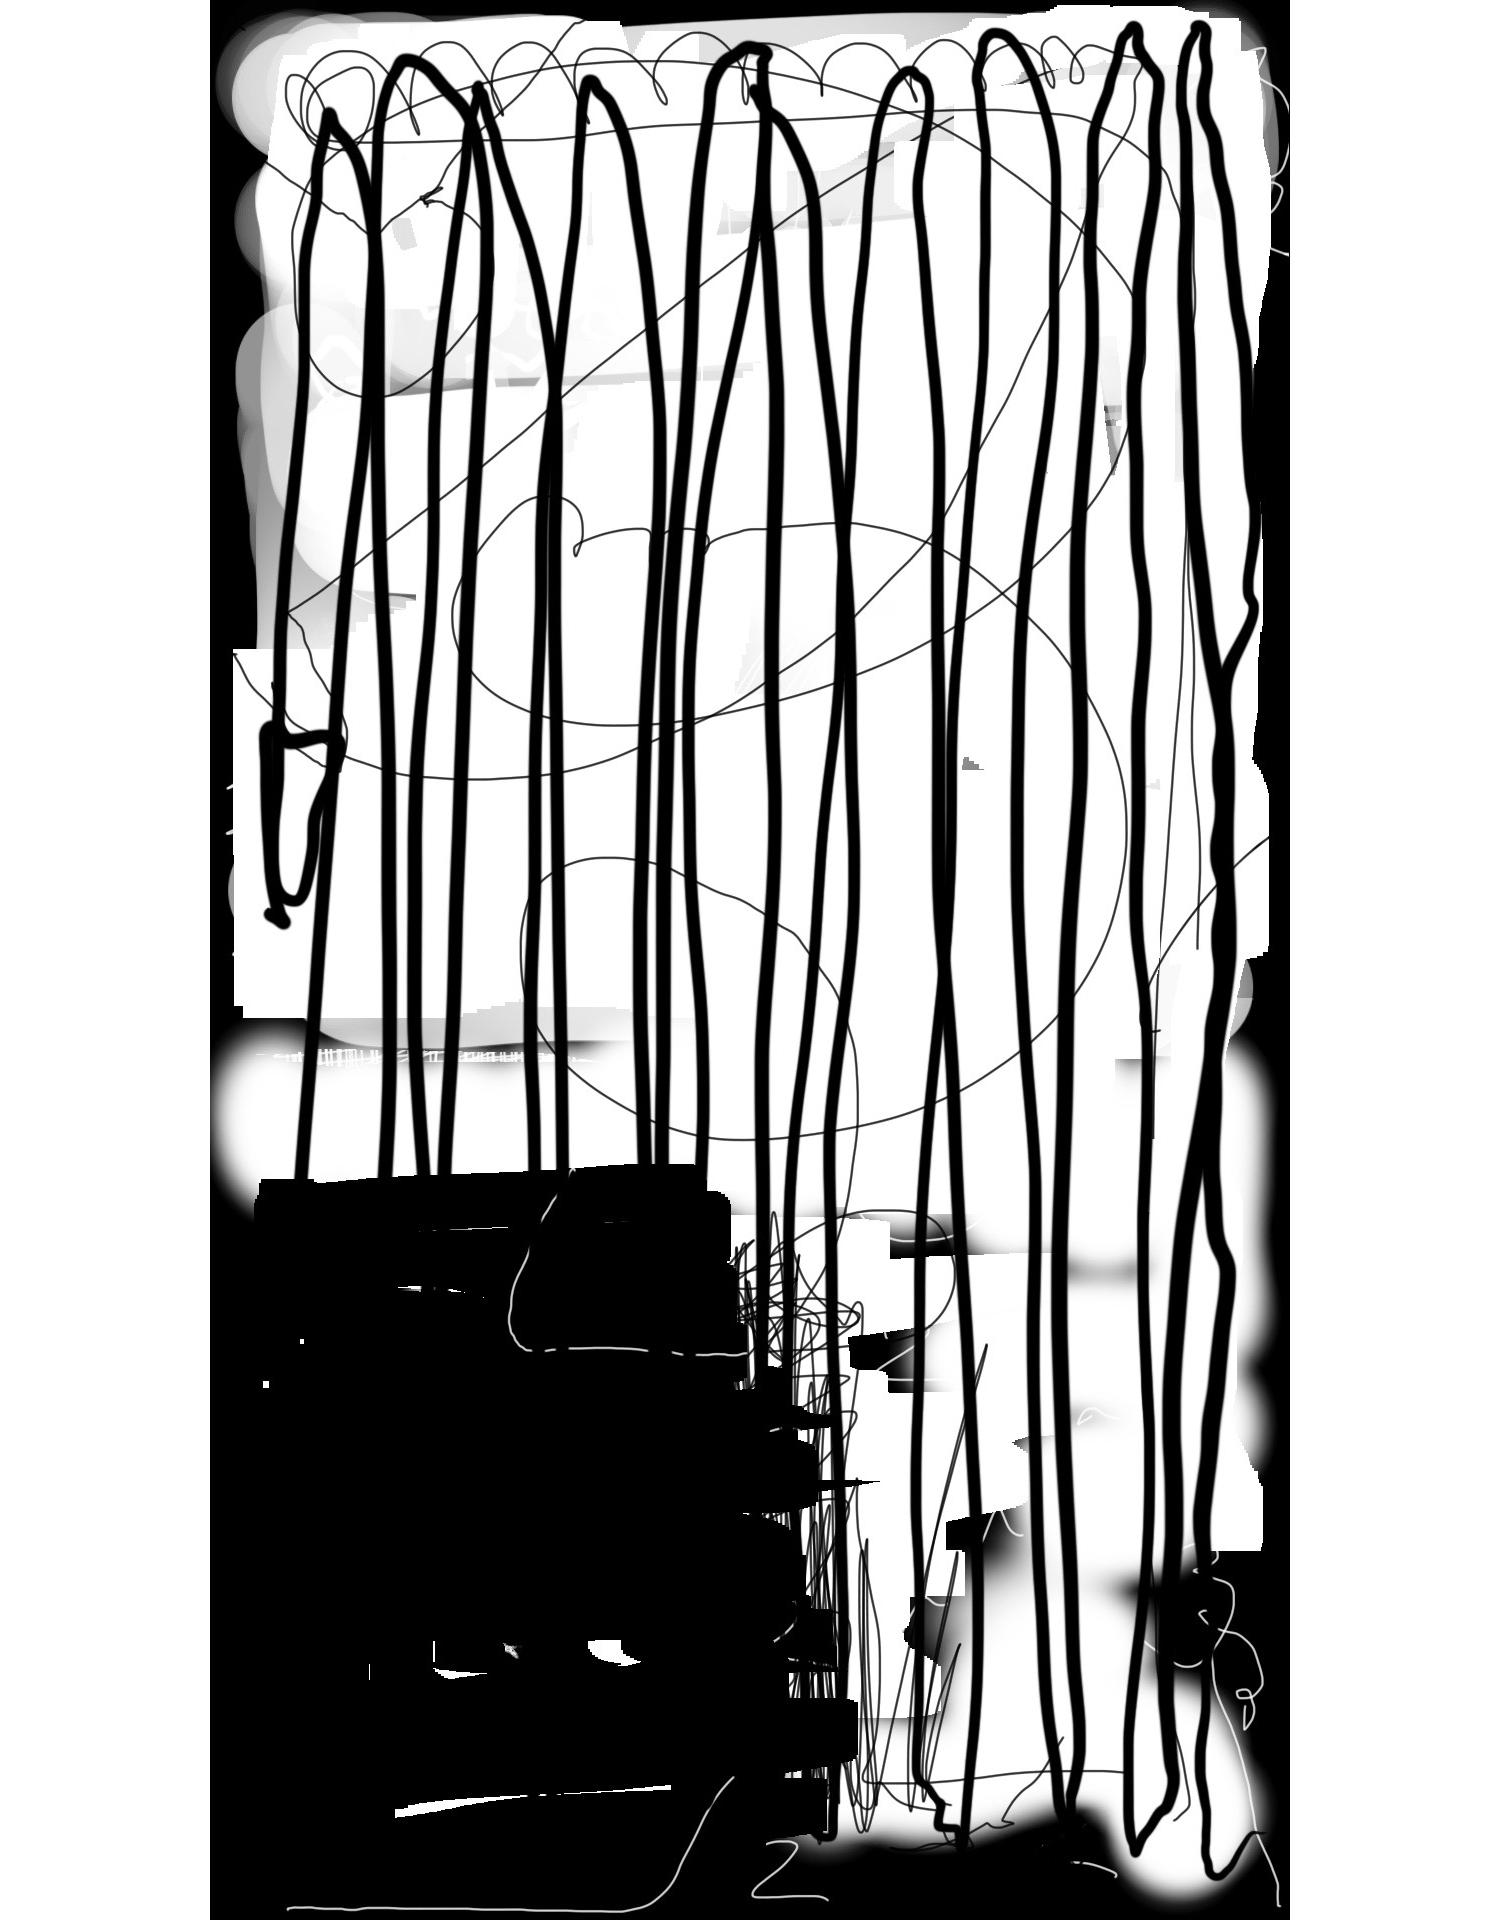 VENUS THE BEAUTIFUL FORMULA COLLECTIVE Daniel Geiger, Oleksiy Koval, Veronika Wenger Digital painting